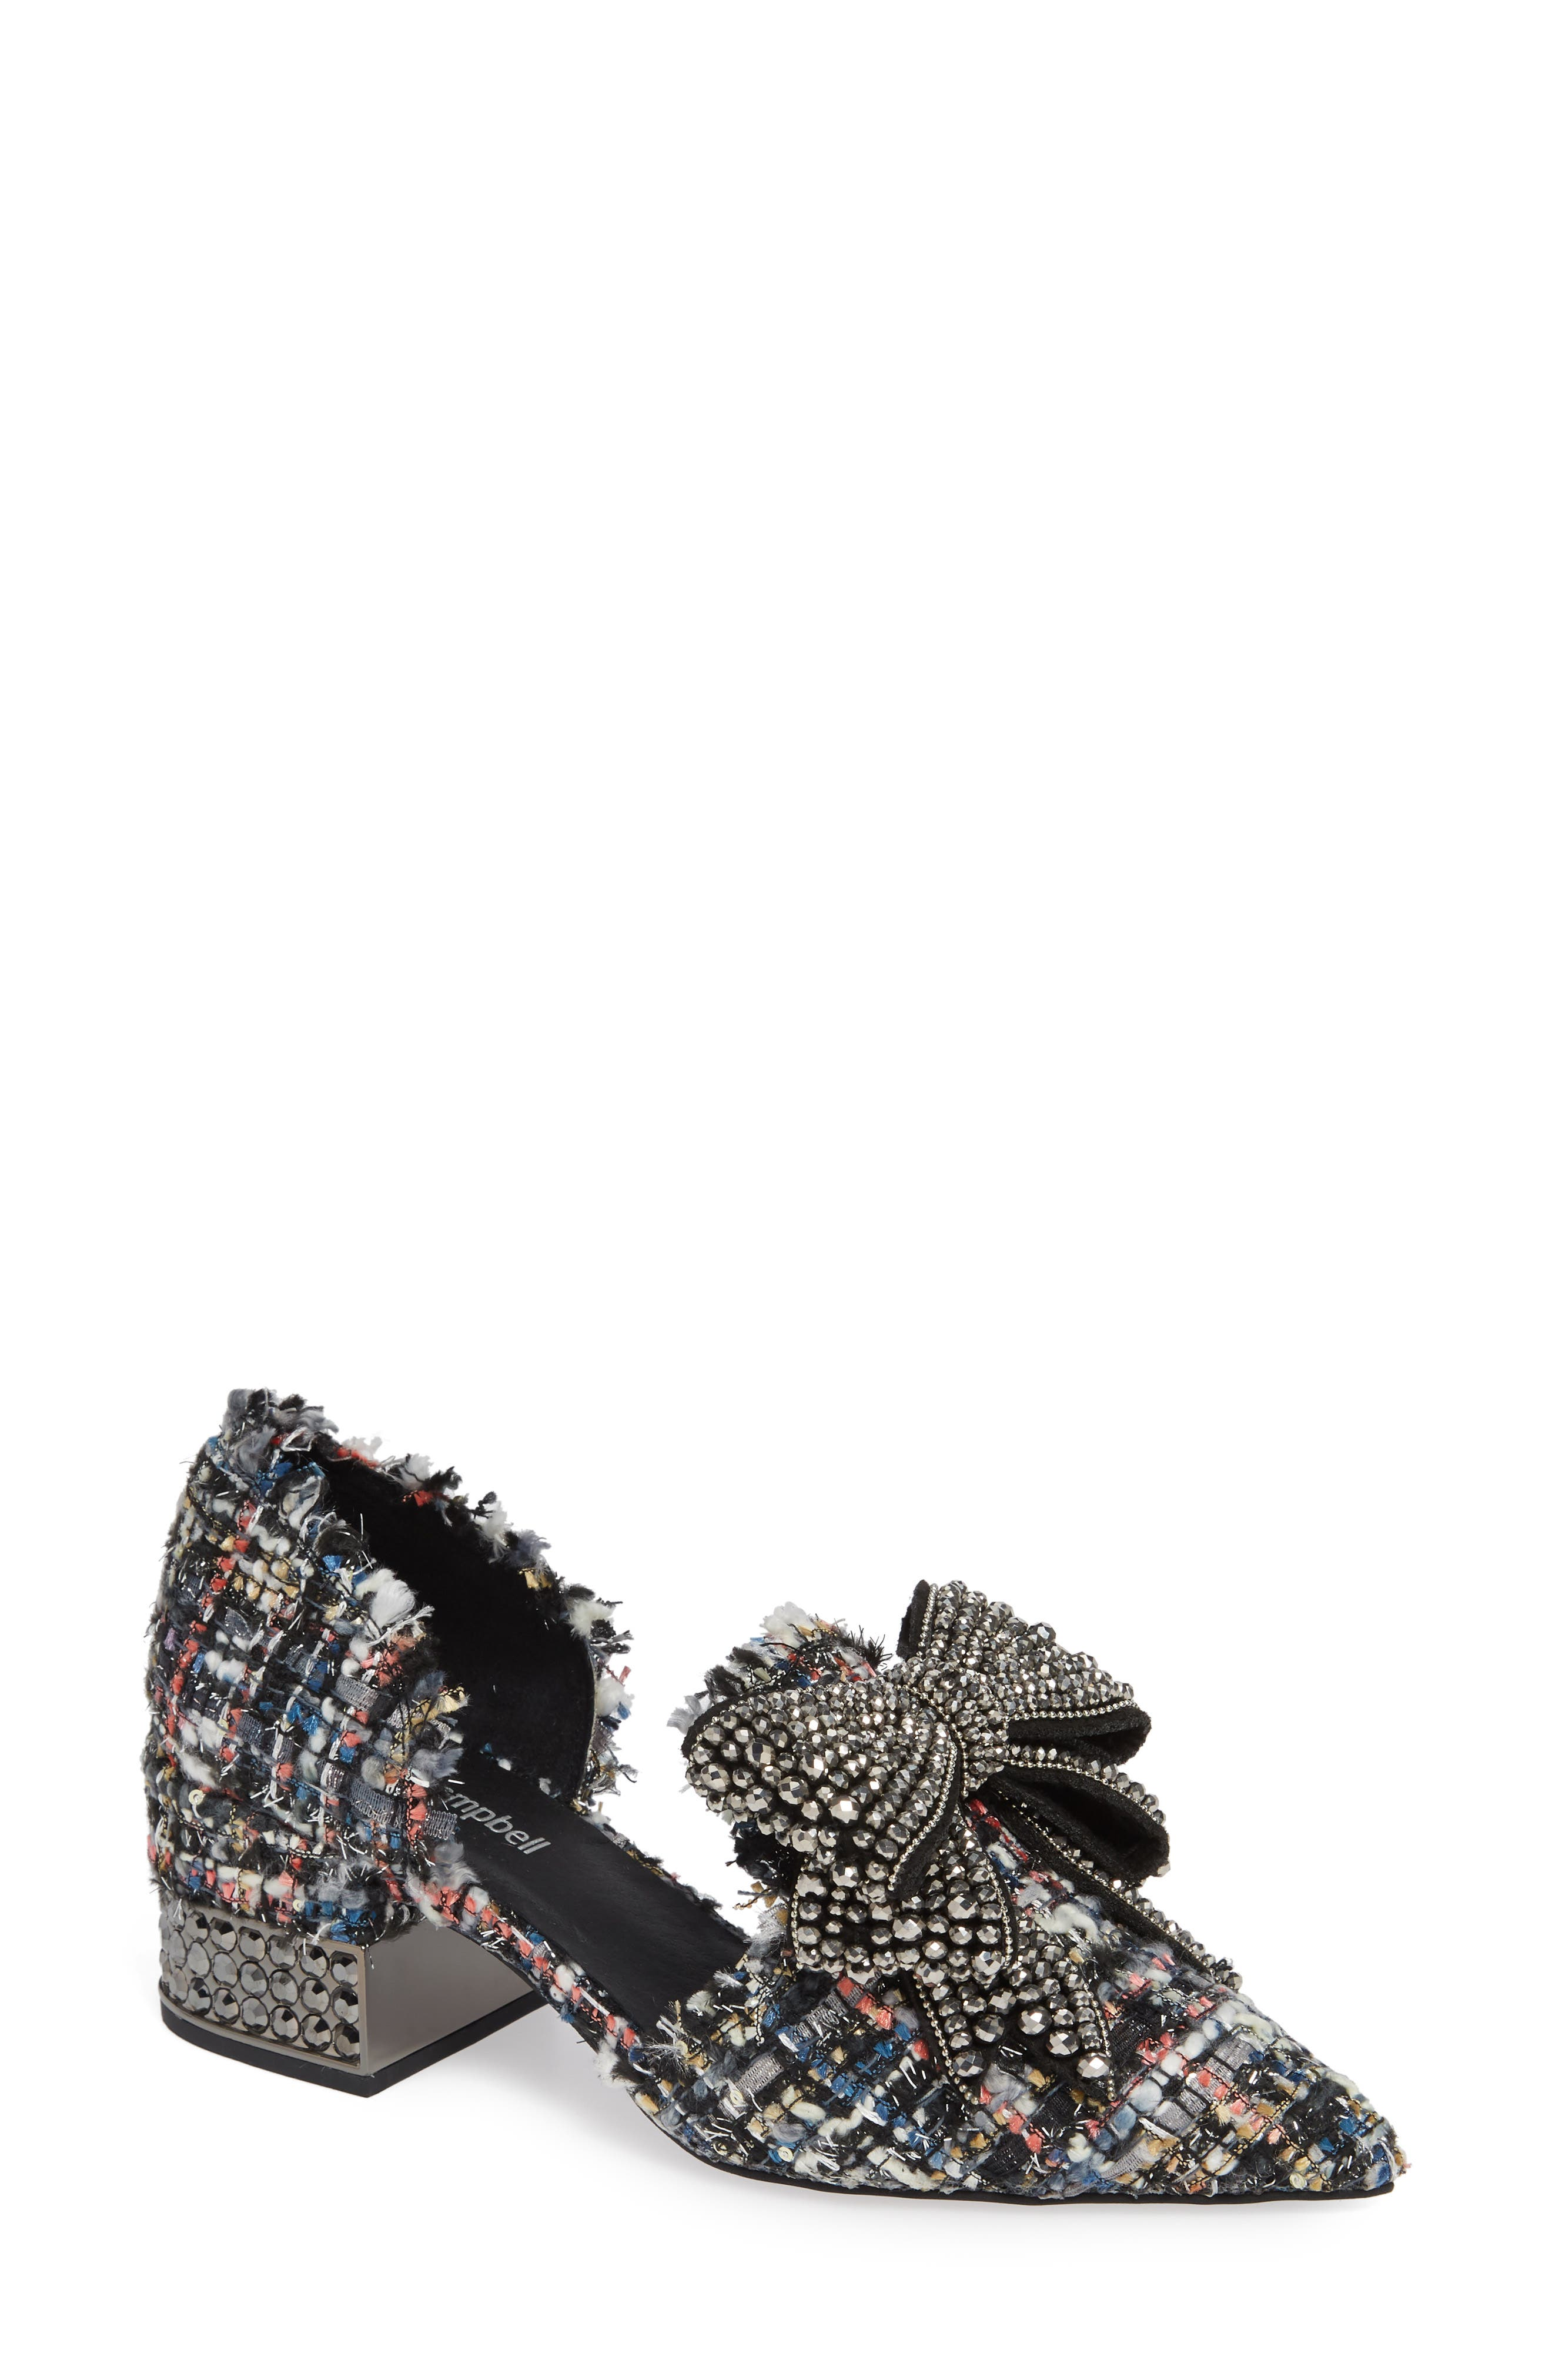 Valenti Embellished Bow Loafer,                         Main,                         color, Black Multi Tweed Pewter